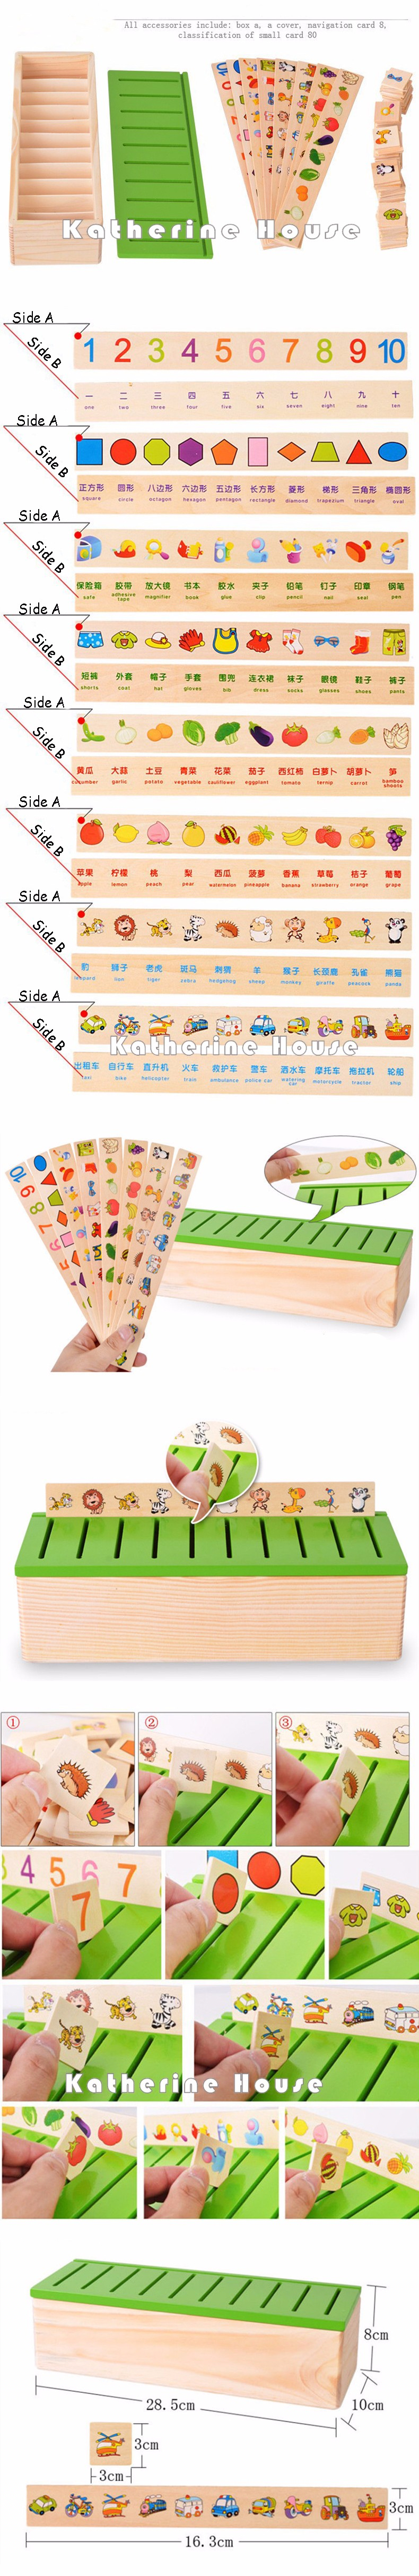 Montessori Mathematical Knowledge Box Toys